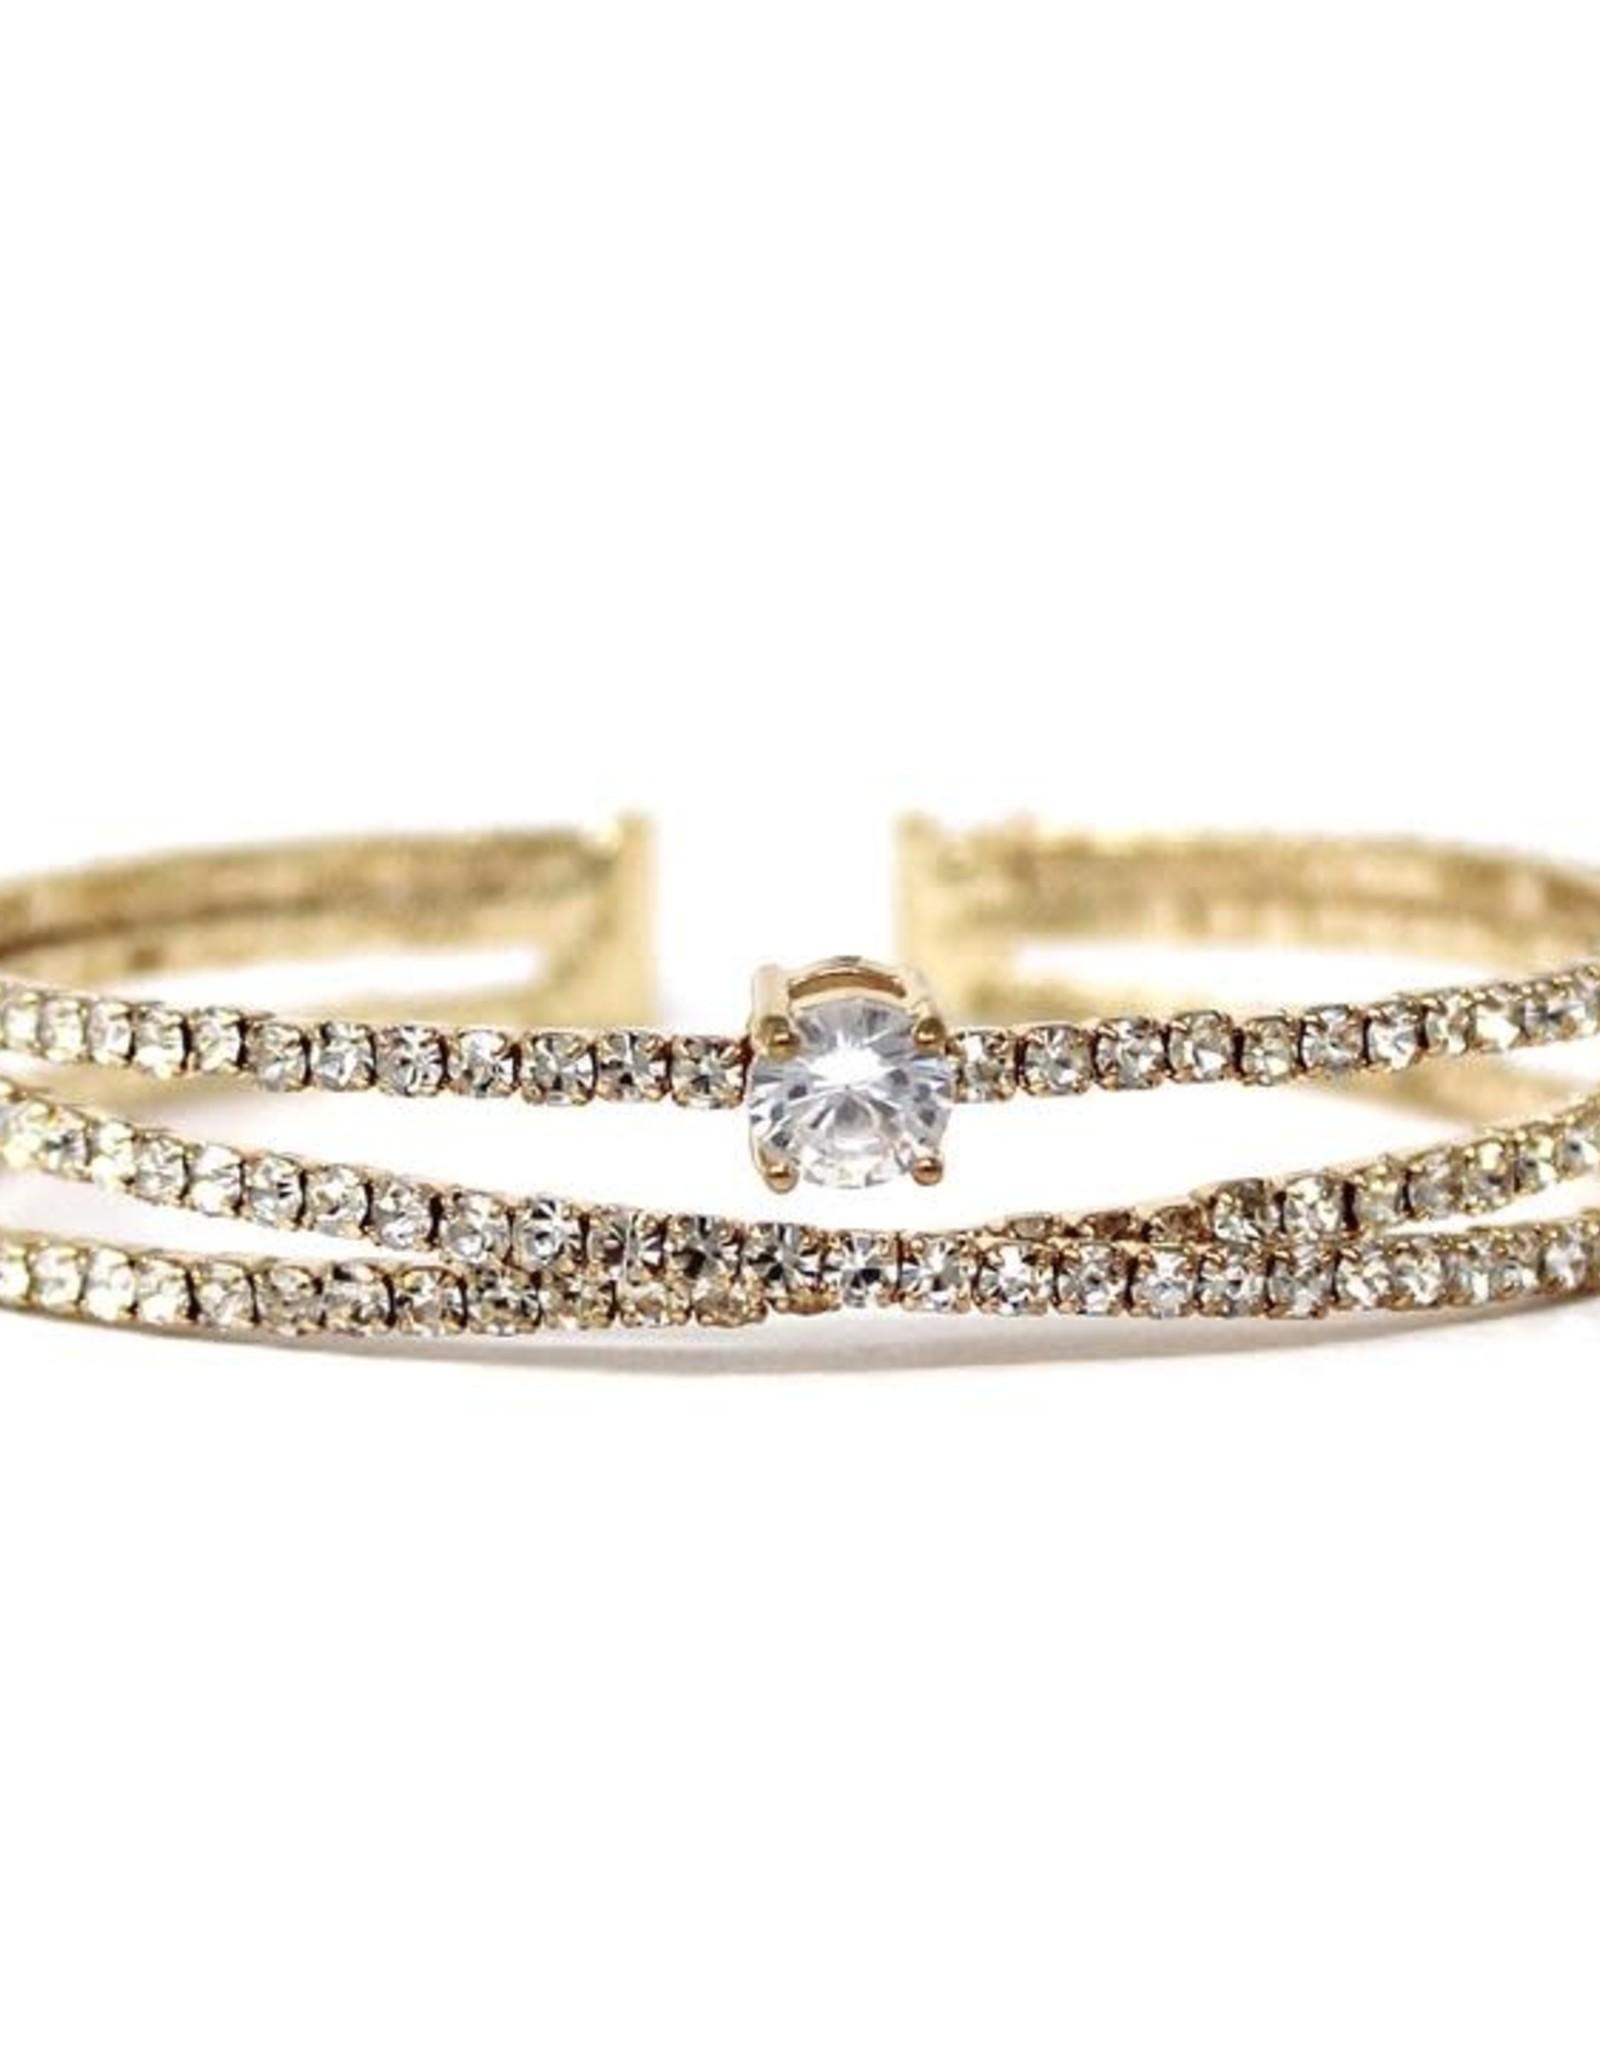 Rhinestone Pave Cuff Bracelet - Gold